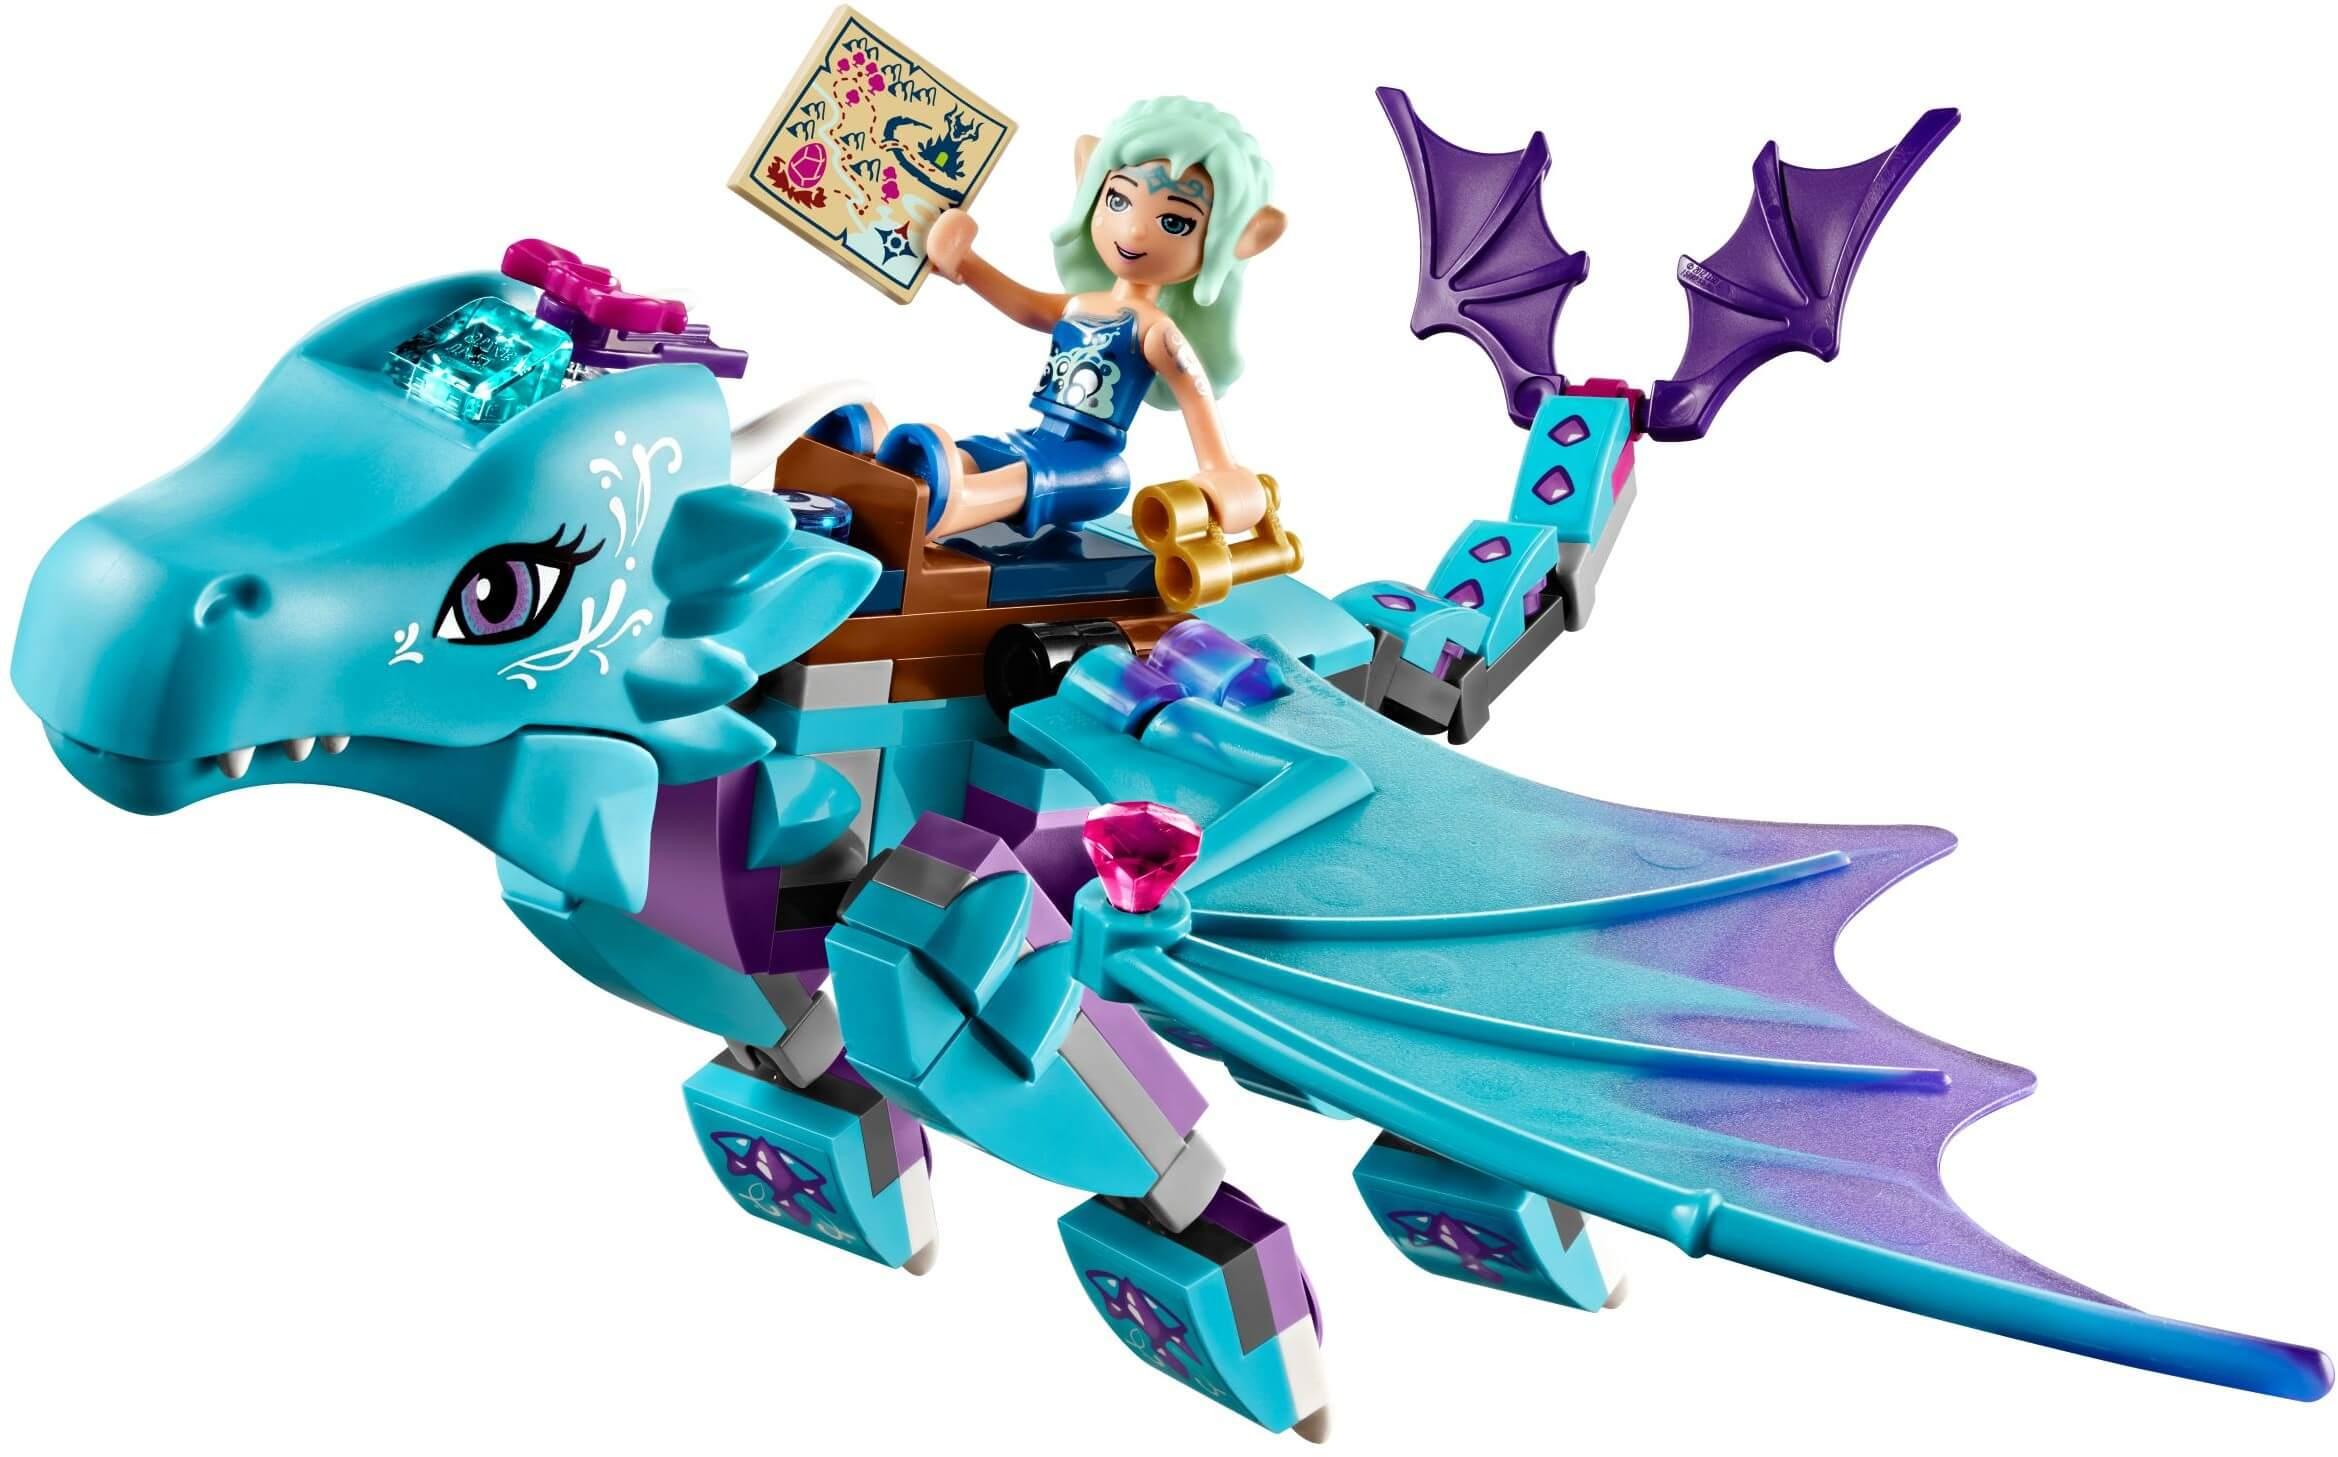 Mua đồ chơi LEGO 41172 - LEGO Elves 41172 - Cuộc Phiêu Lưu Của Rồng Nước (LEGO Elves The Water Dragon Adventure 41172)